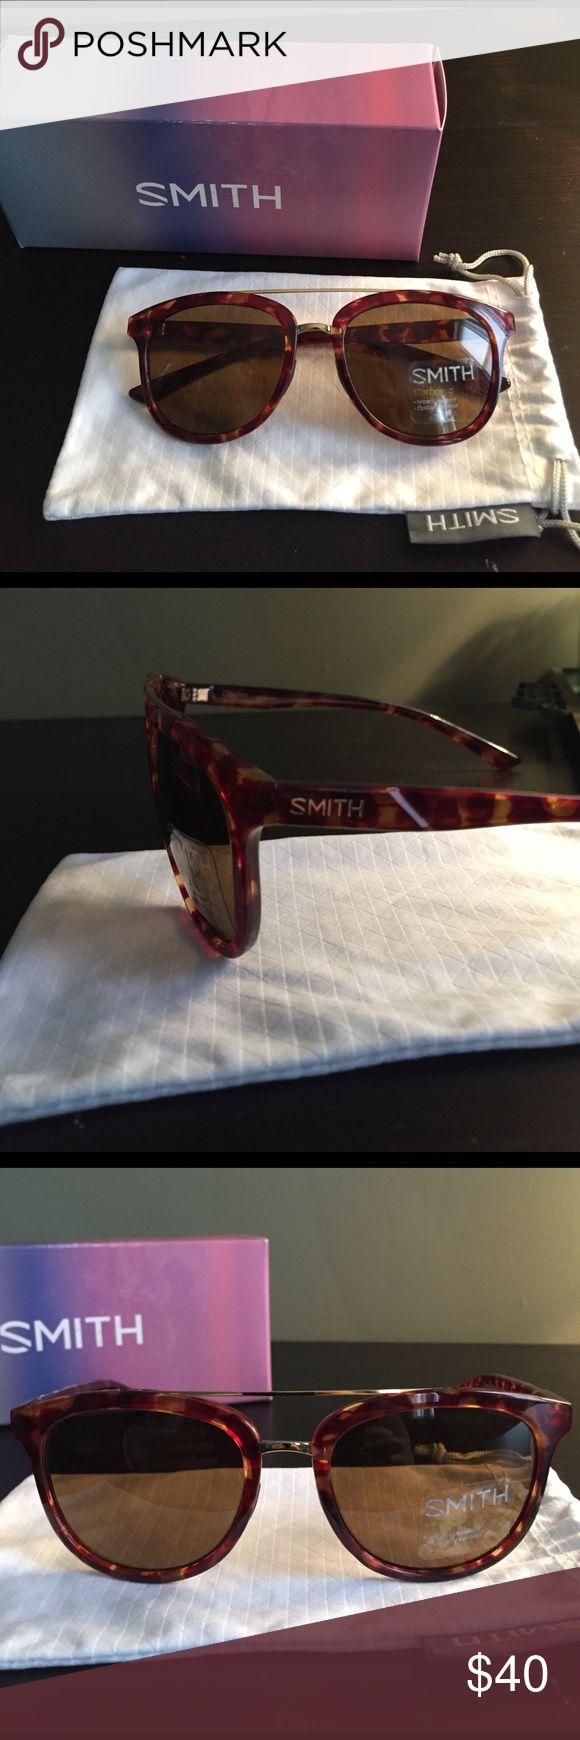 Smith Optics Clayton Sunglasses Smith Optics Clayton Tortoiseshell Sunglasses. Brand new in box. Measures 54mm/19mm/135mm. Smith Optics Accessories Sunglasses